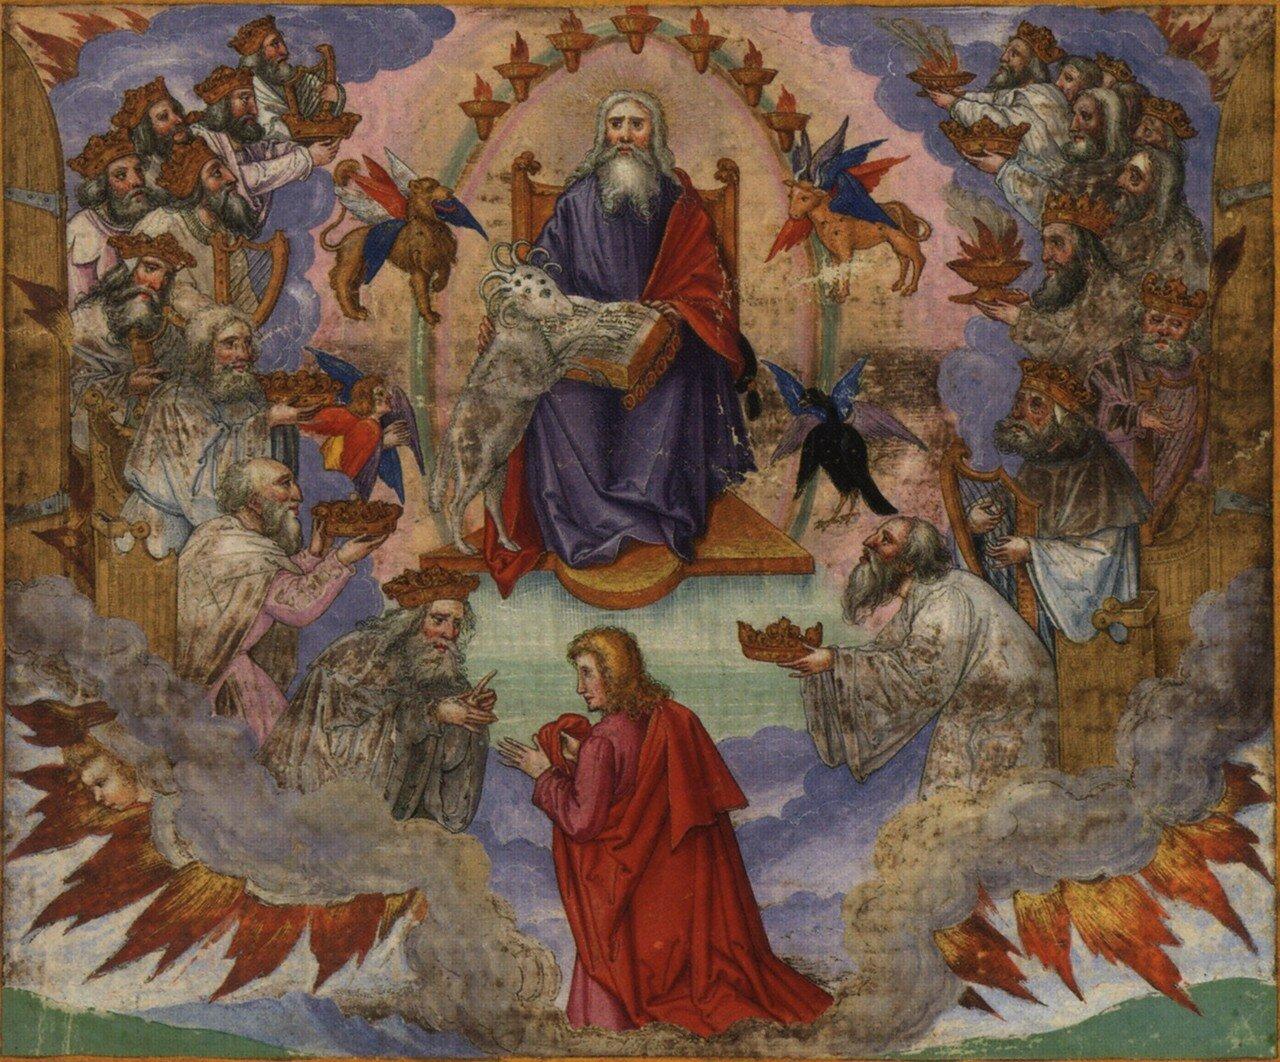 Ottheinrich_Folio287r_Rev4-5.jpg